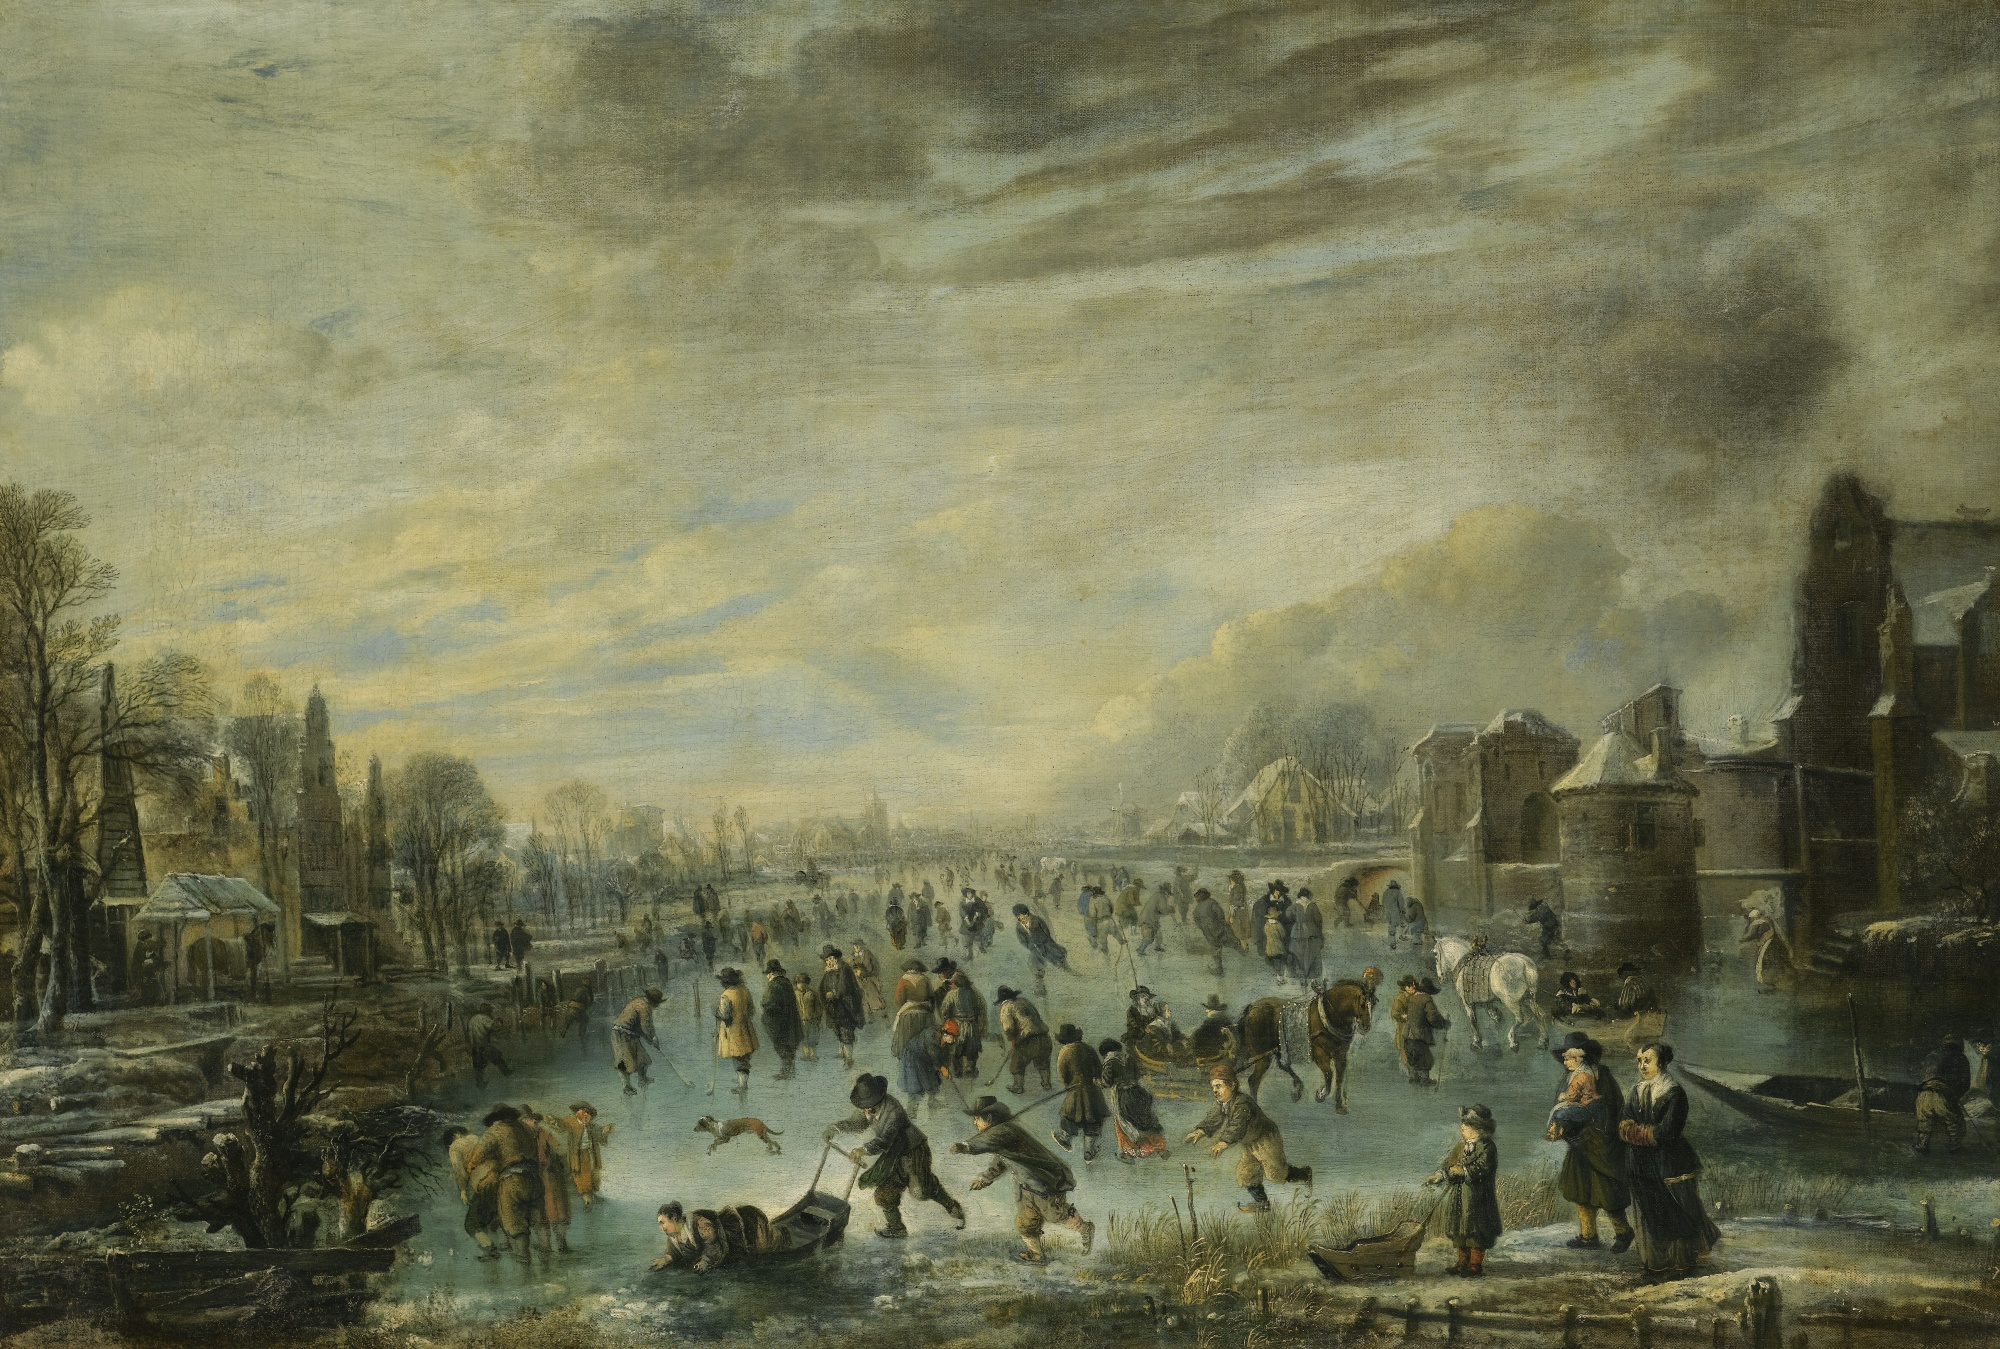 Landscape Oil Painting Signed Aeg